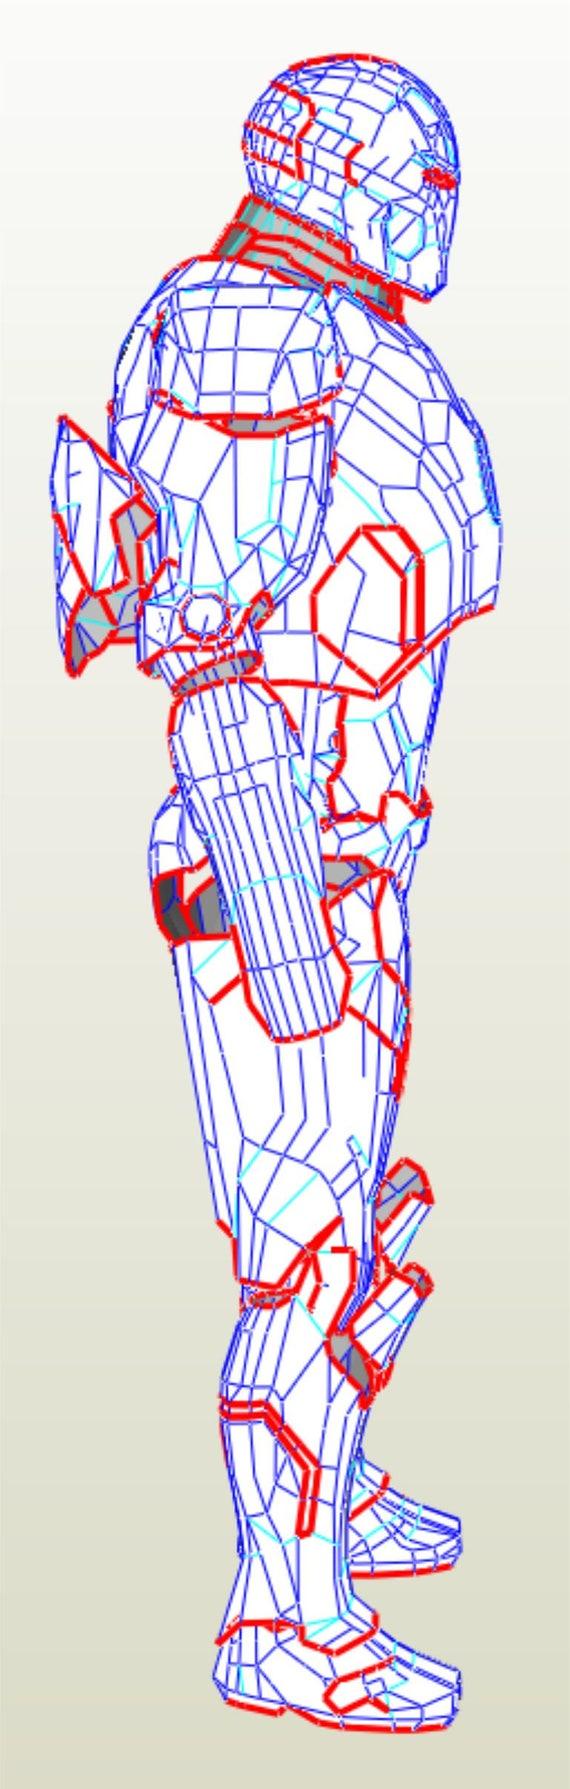 Eva Foam Iron Man Mk 42 Armor Suit Pdf Pdo Templates Etsy